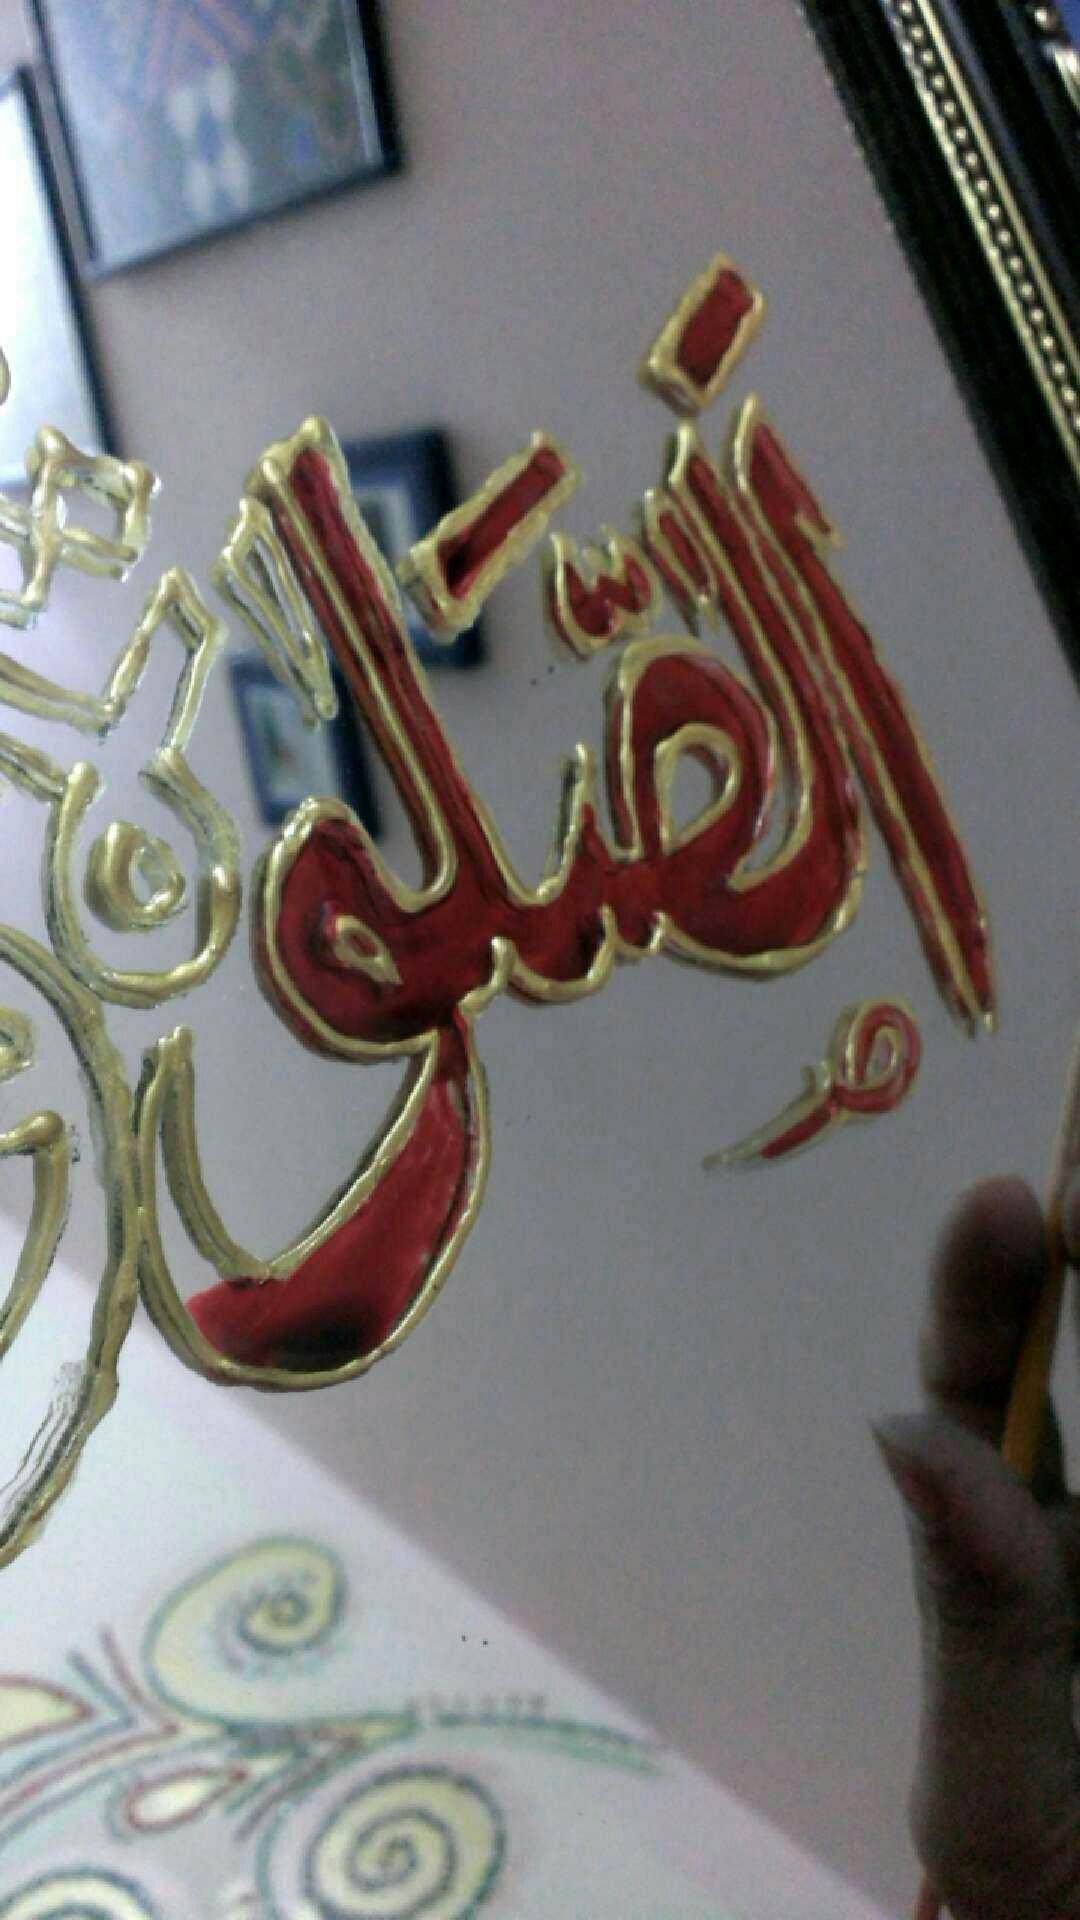 how-to-glasspaint-islamic-calligraphy-wall-art-tutorial